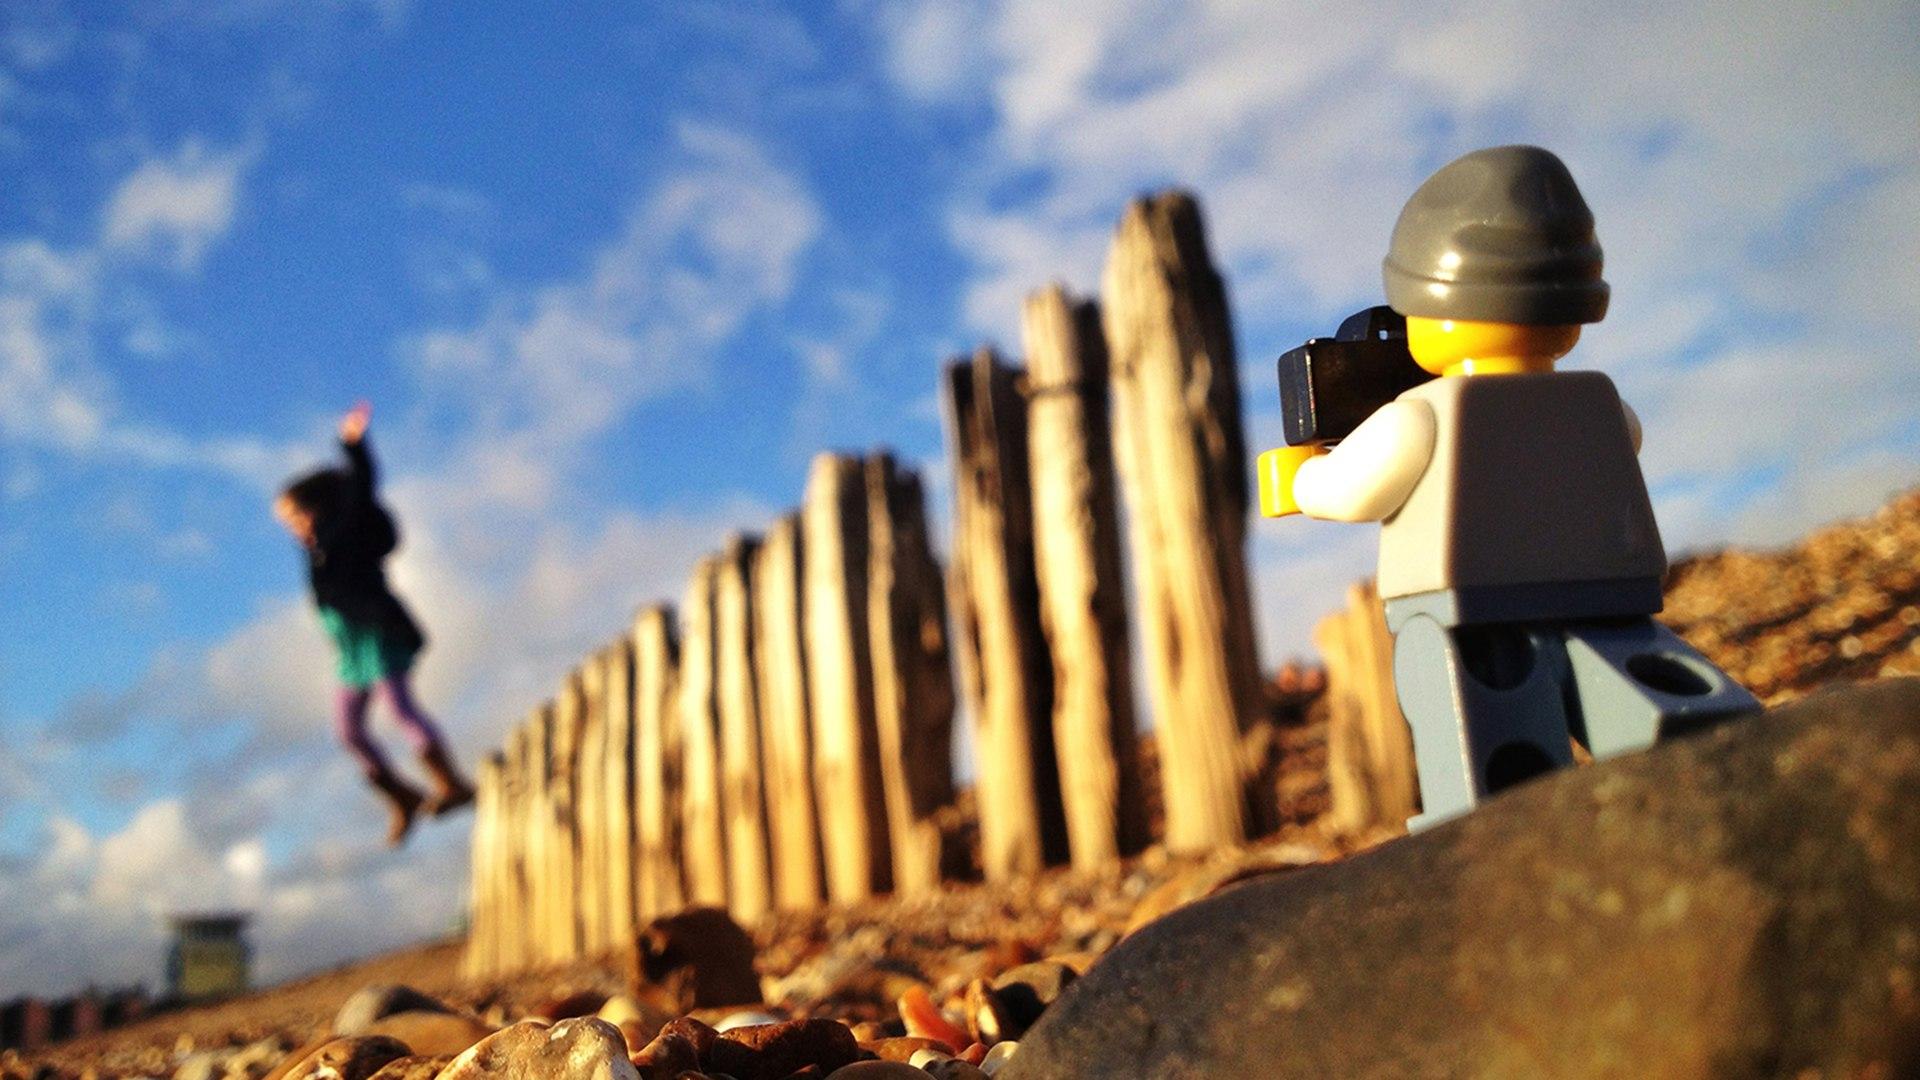 365 Days of Legographer